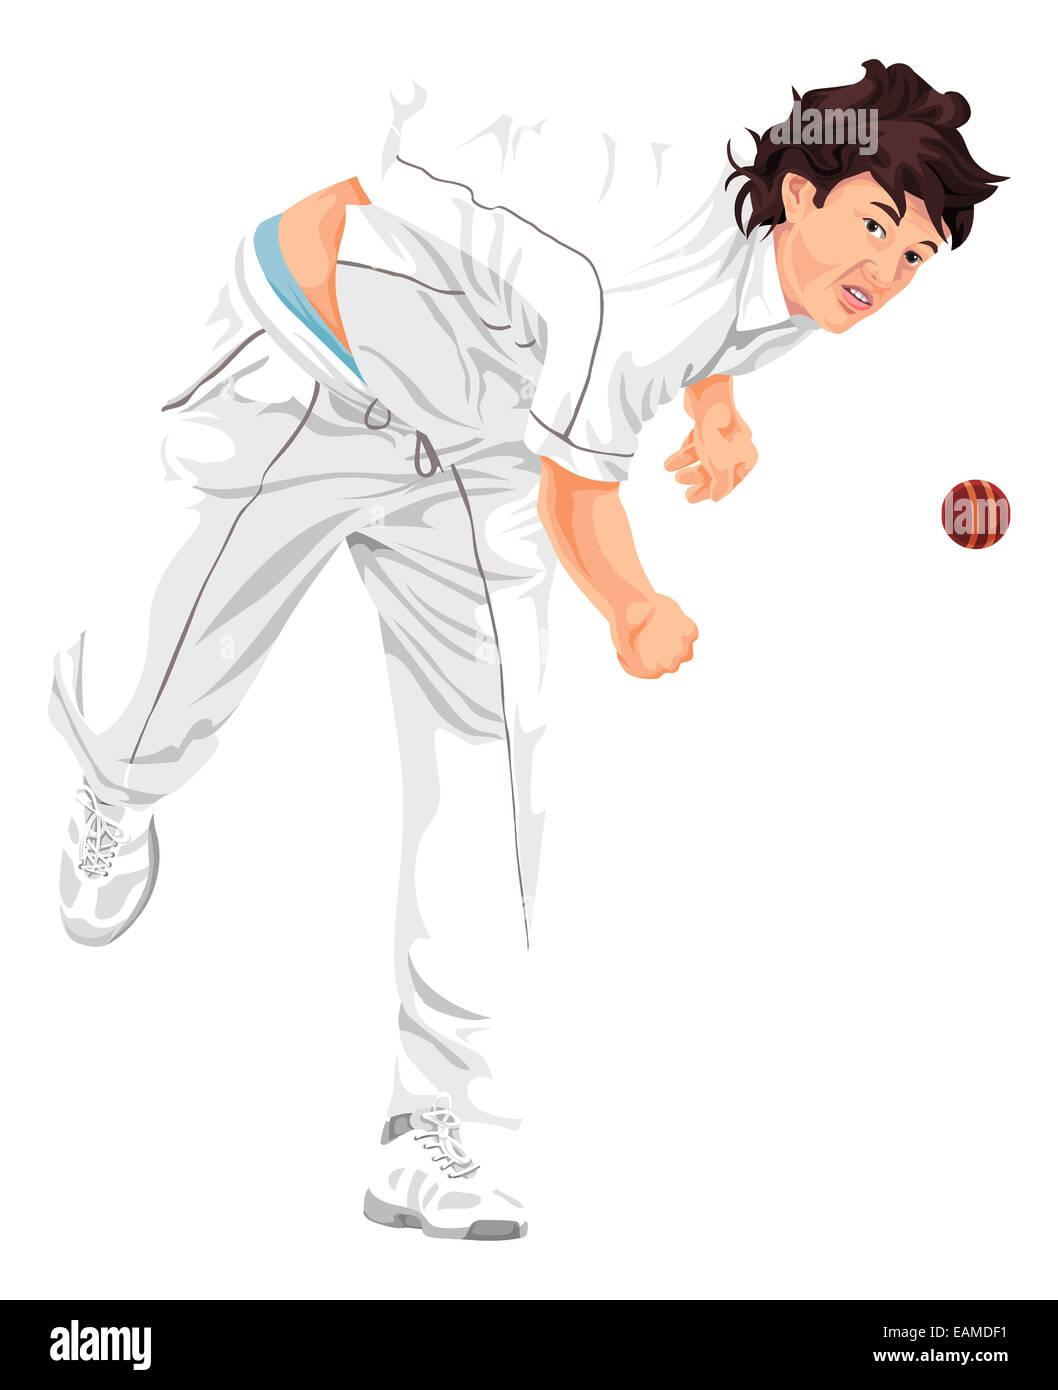 illustration cricket player bowler bowling stock photos